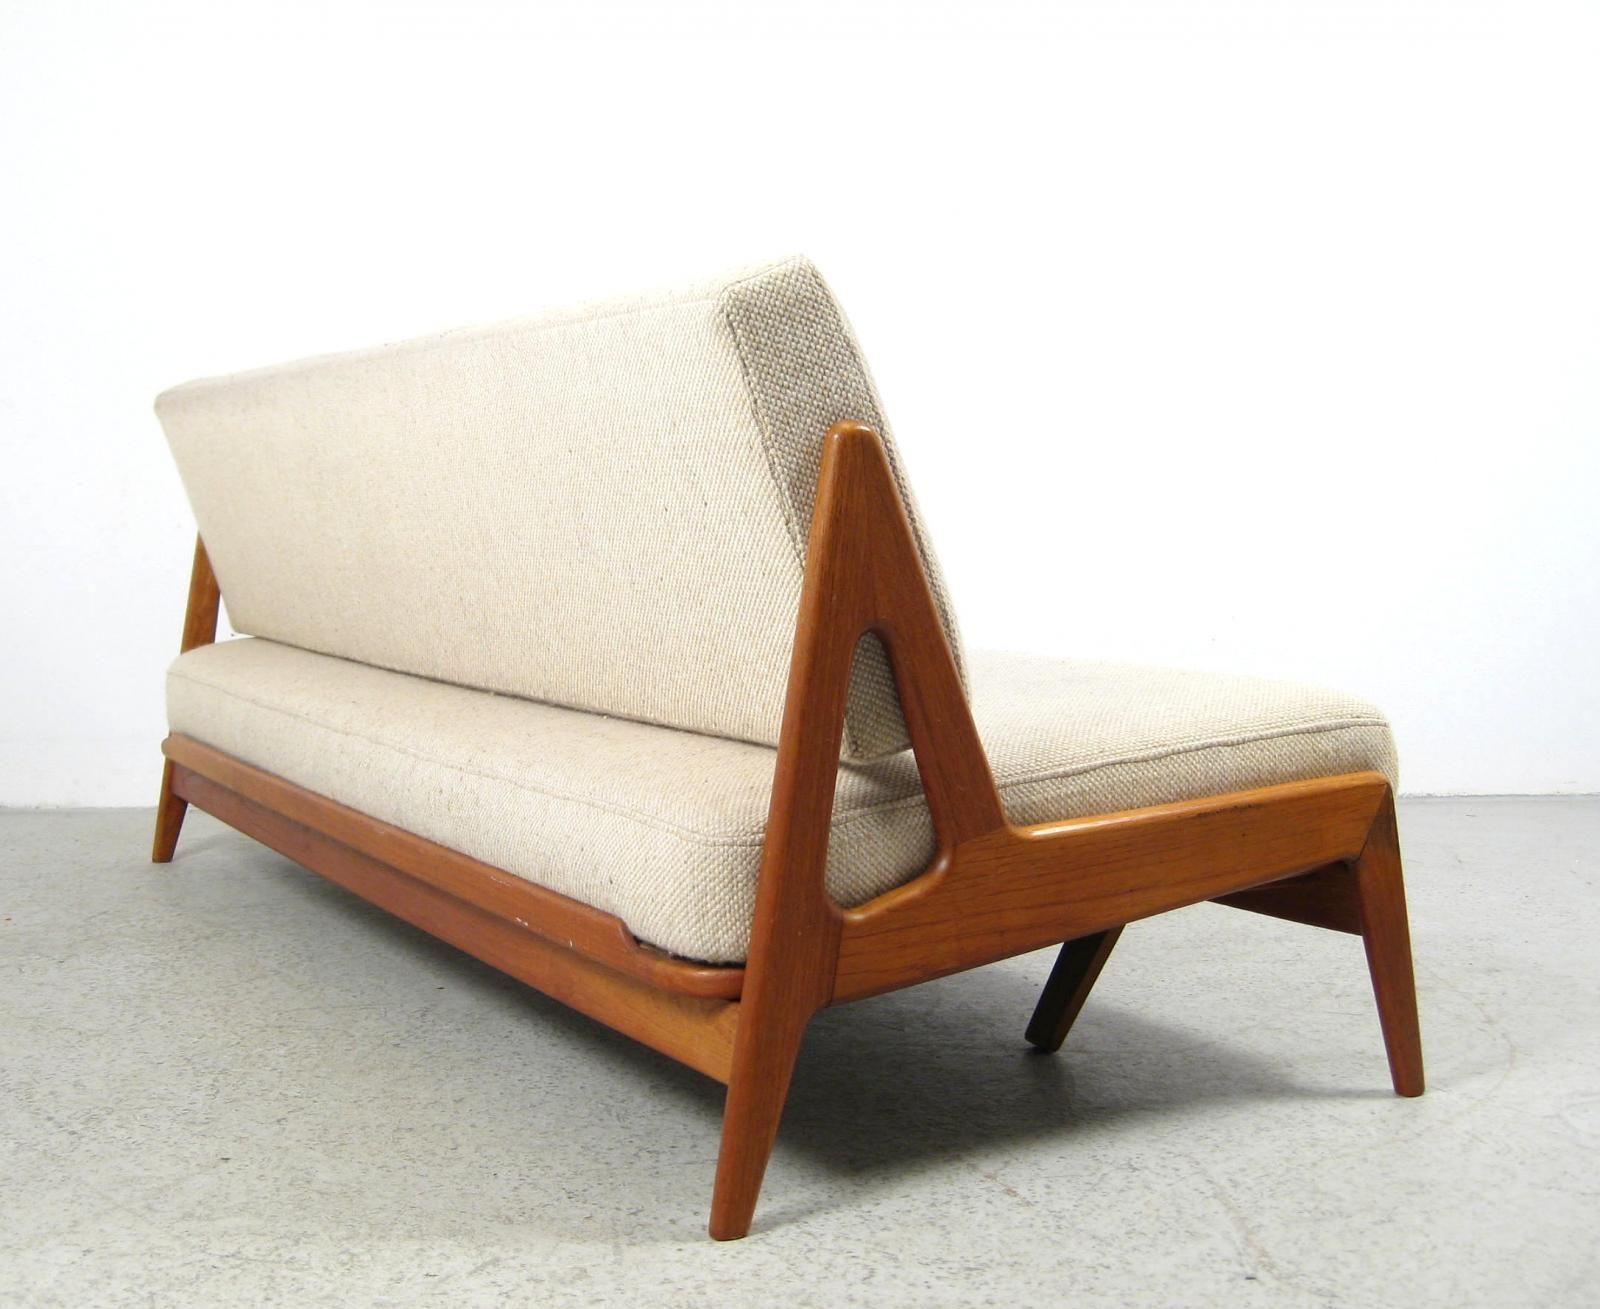 Arne Wahl Iversen Teak Daybed For Thysen Nielsen 1956 Scandinavian Furniture Design Usa Furniture Scandinavian Furniture